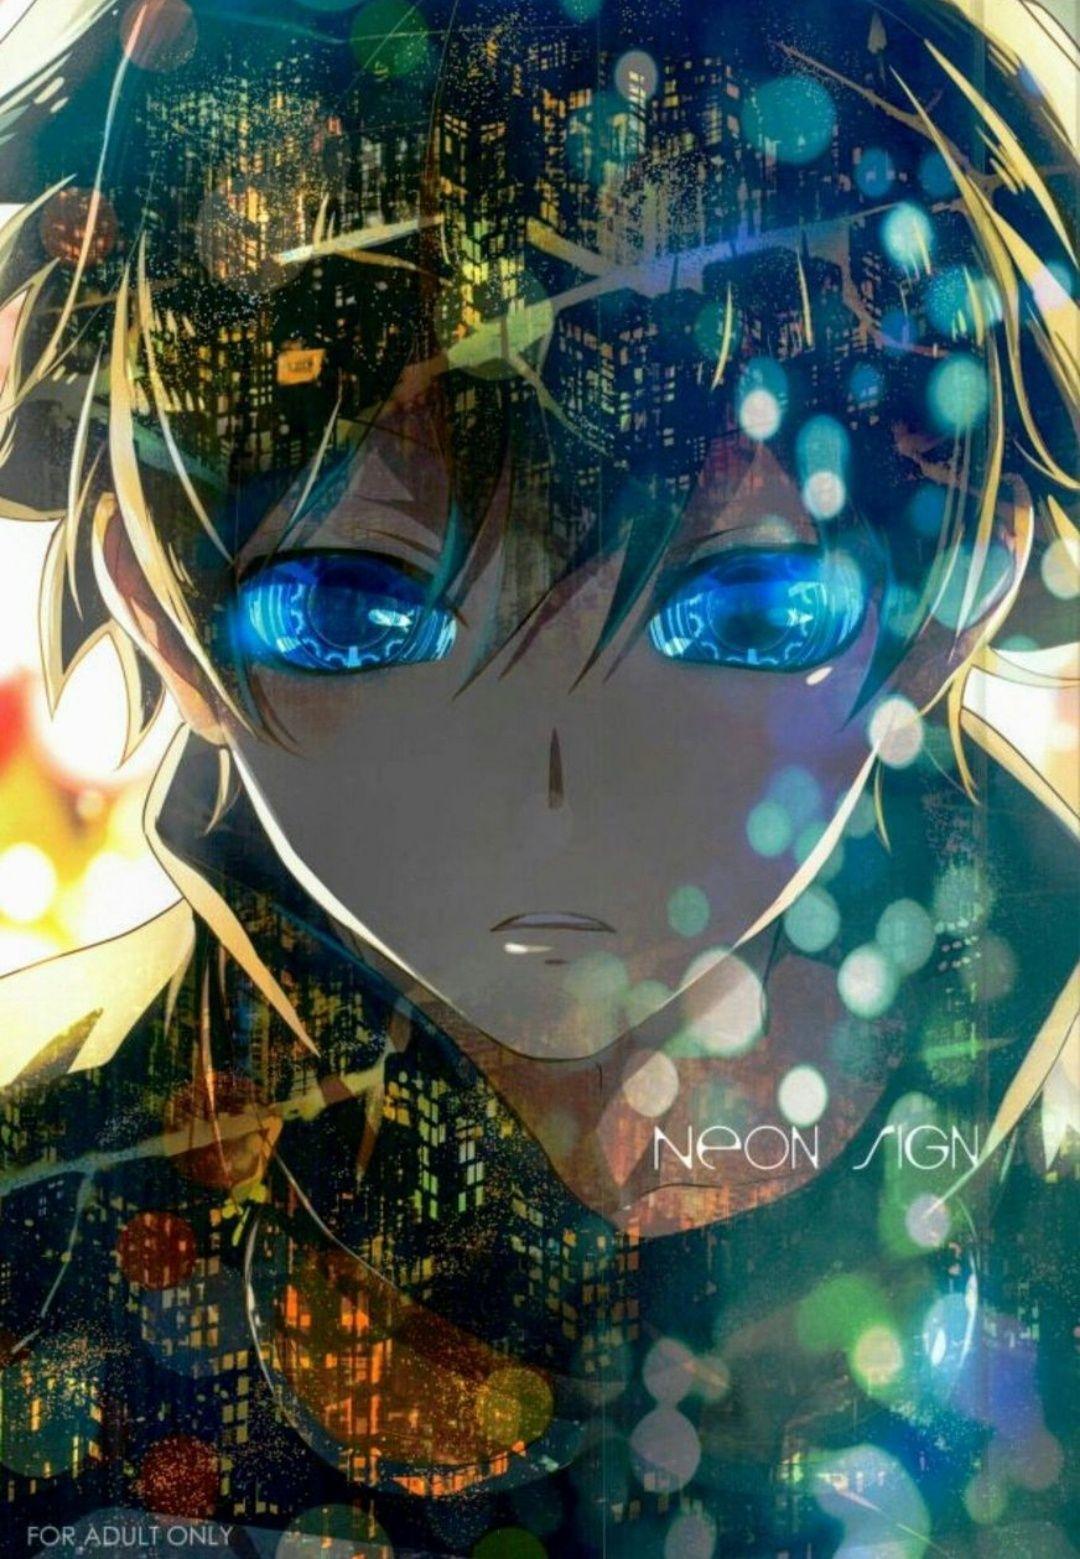 kumpulan gambar² anime koleksi autor random Random